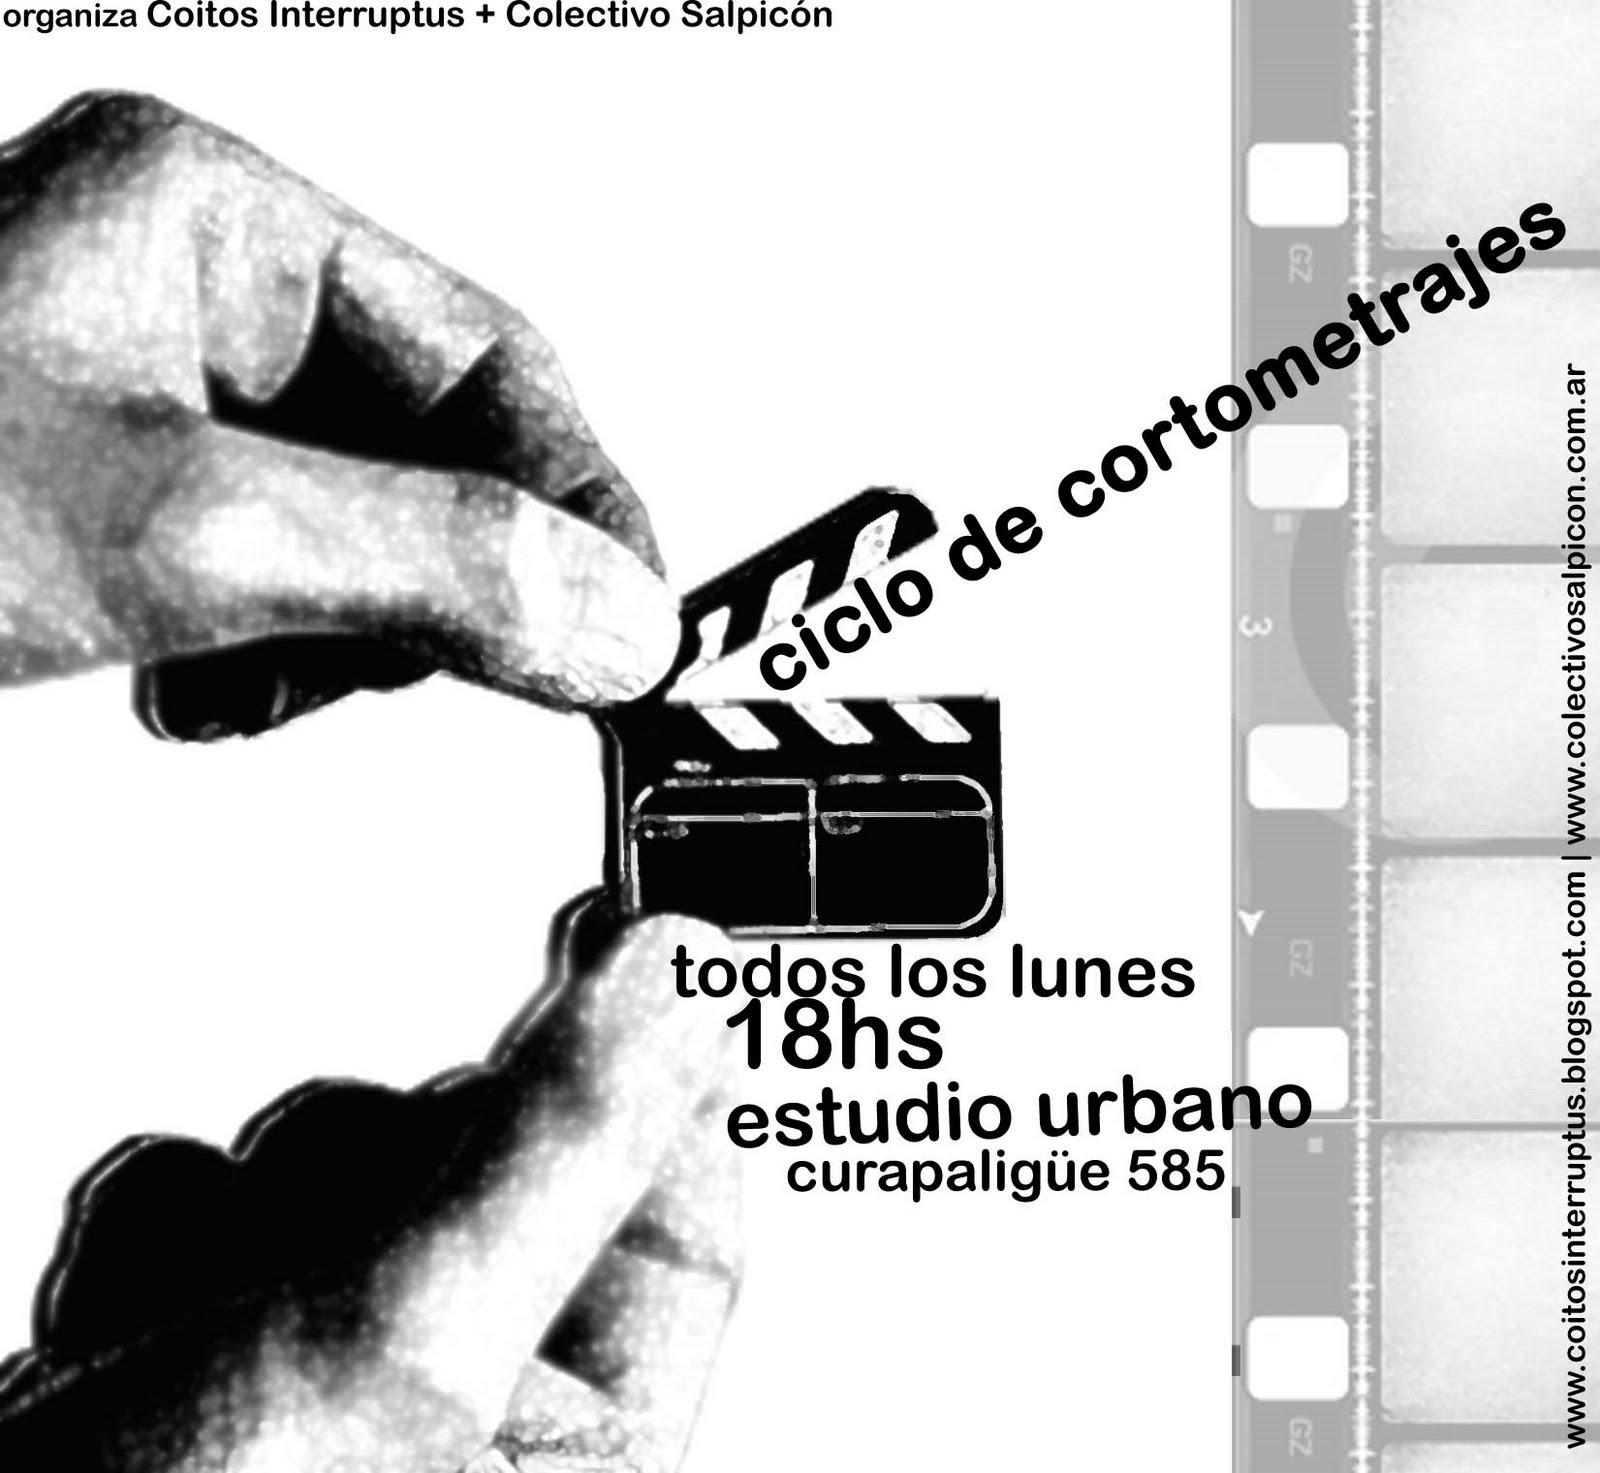 http://1.bp.blogspot.com/_Qi1c_9SNpc8/SwfAGpxdSAI/AAAAAAAABgY/Nl3guEL_OtM/s1600/folleto+ciclo+EU!+copy.jpg